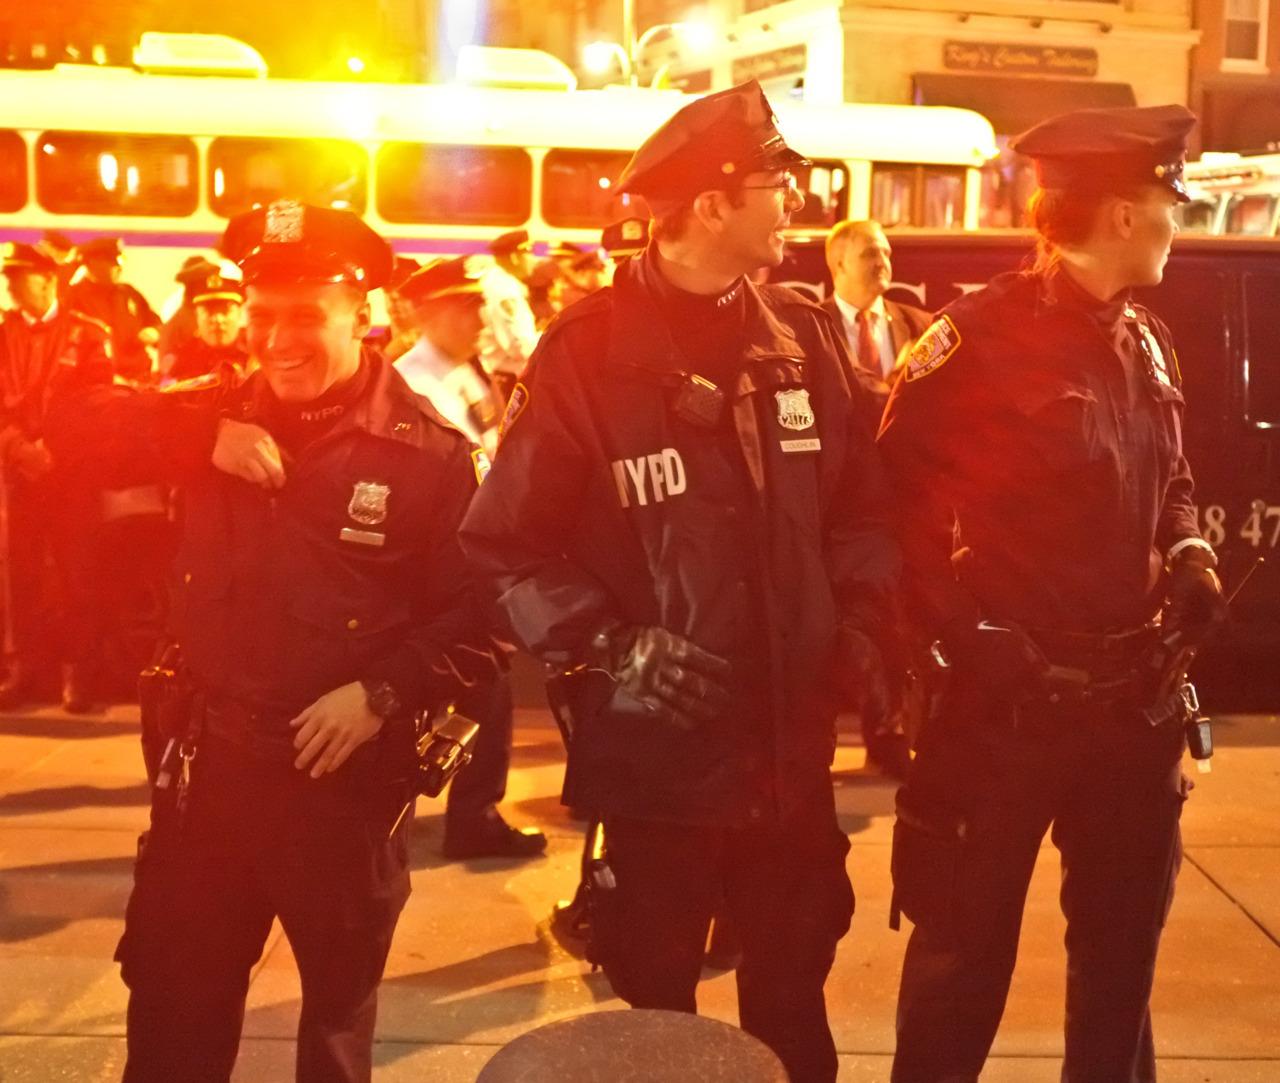 127 - NYPD Lights   #366Project #FujiX100